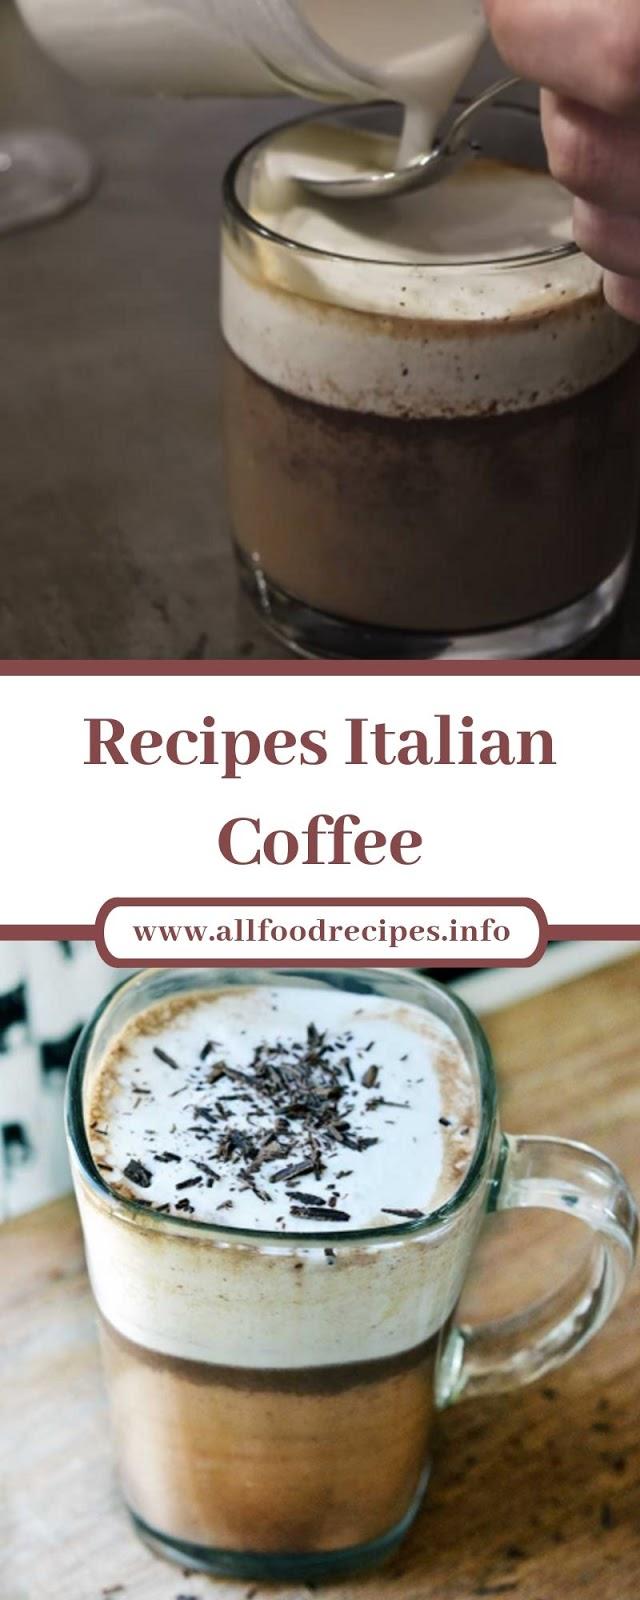 Recipes Italian Coffee